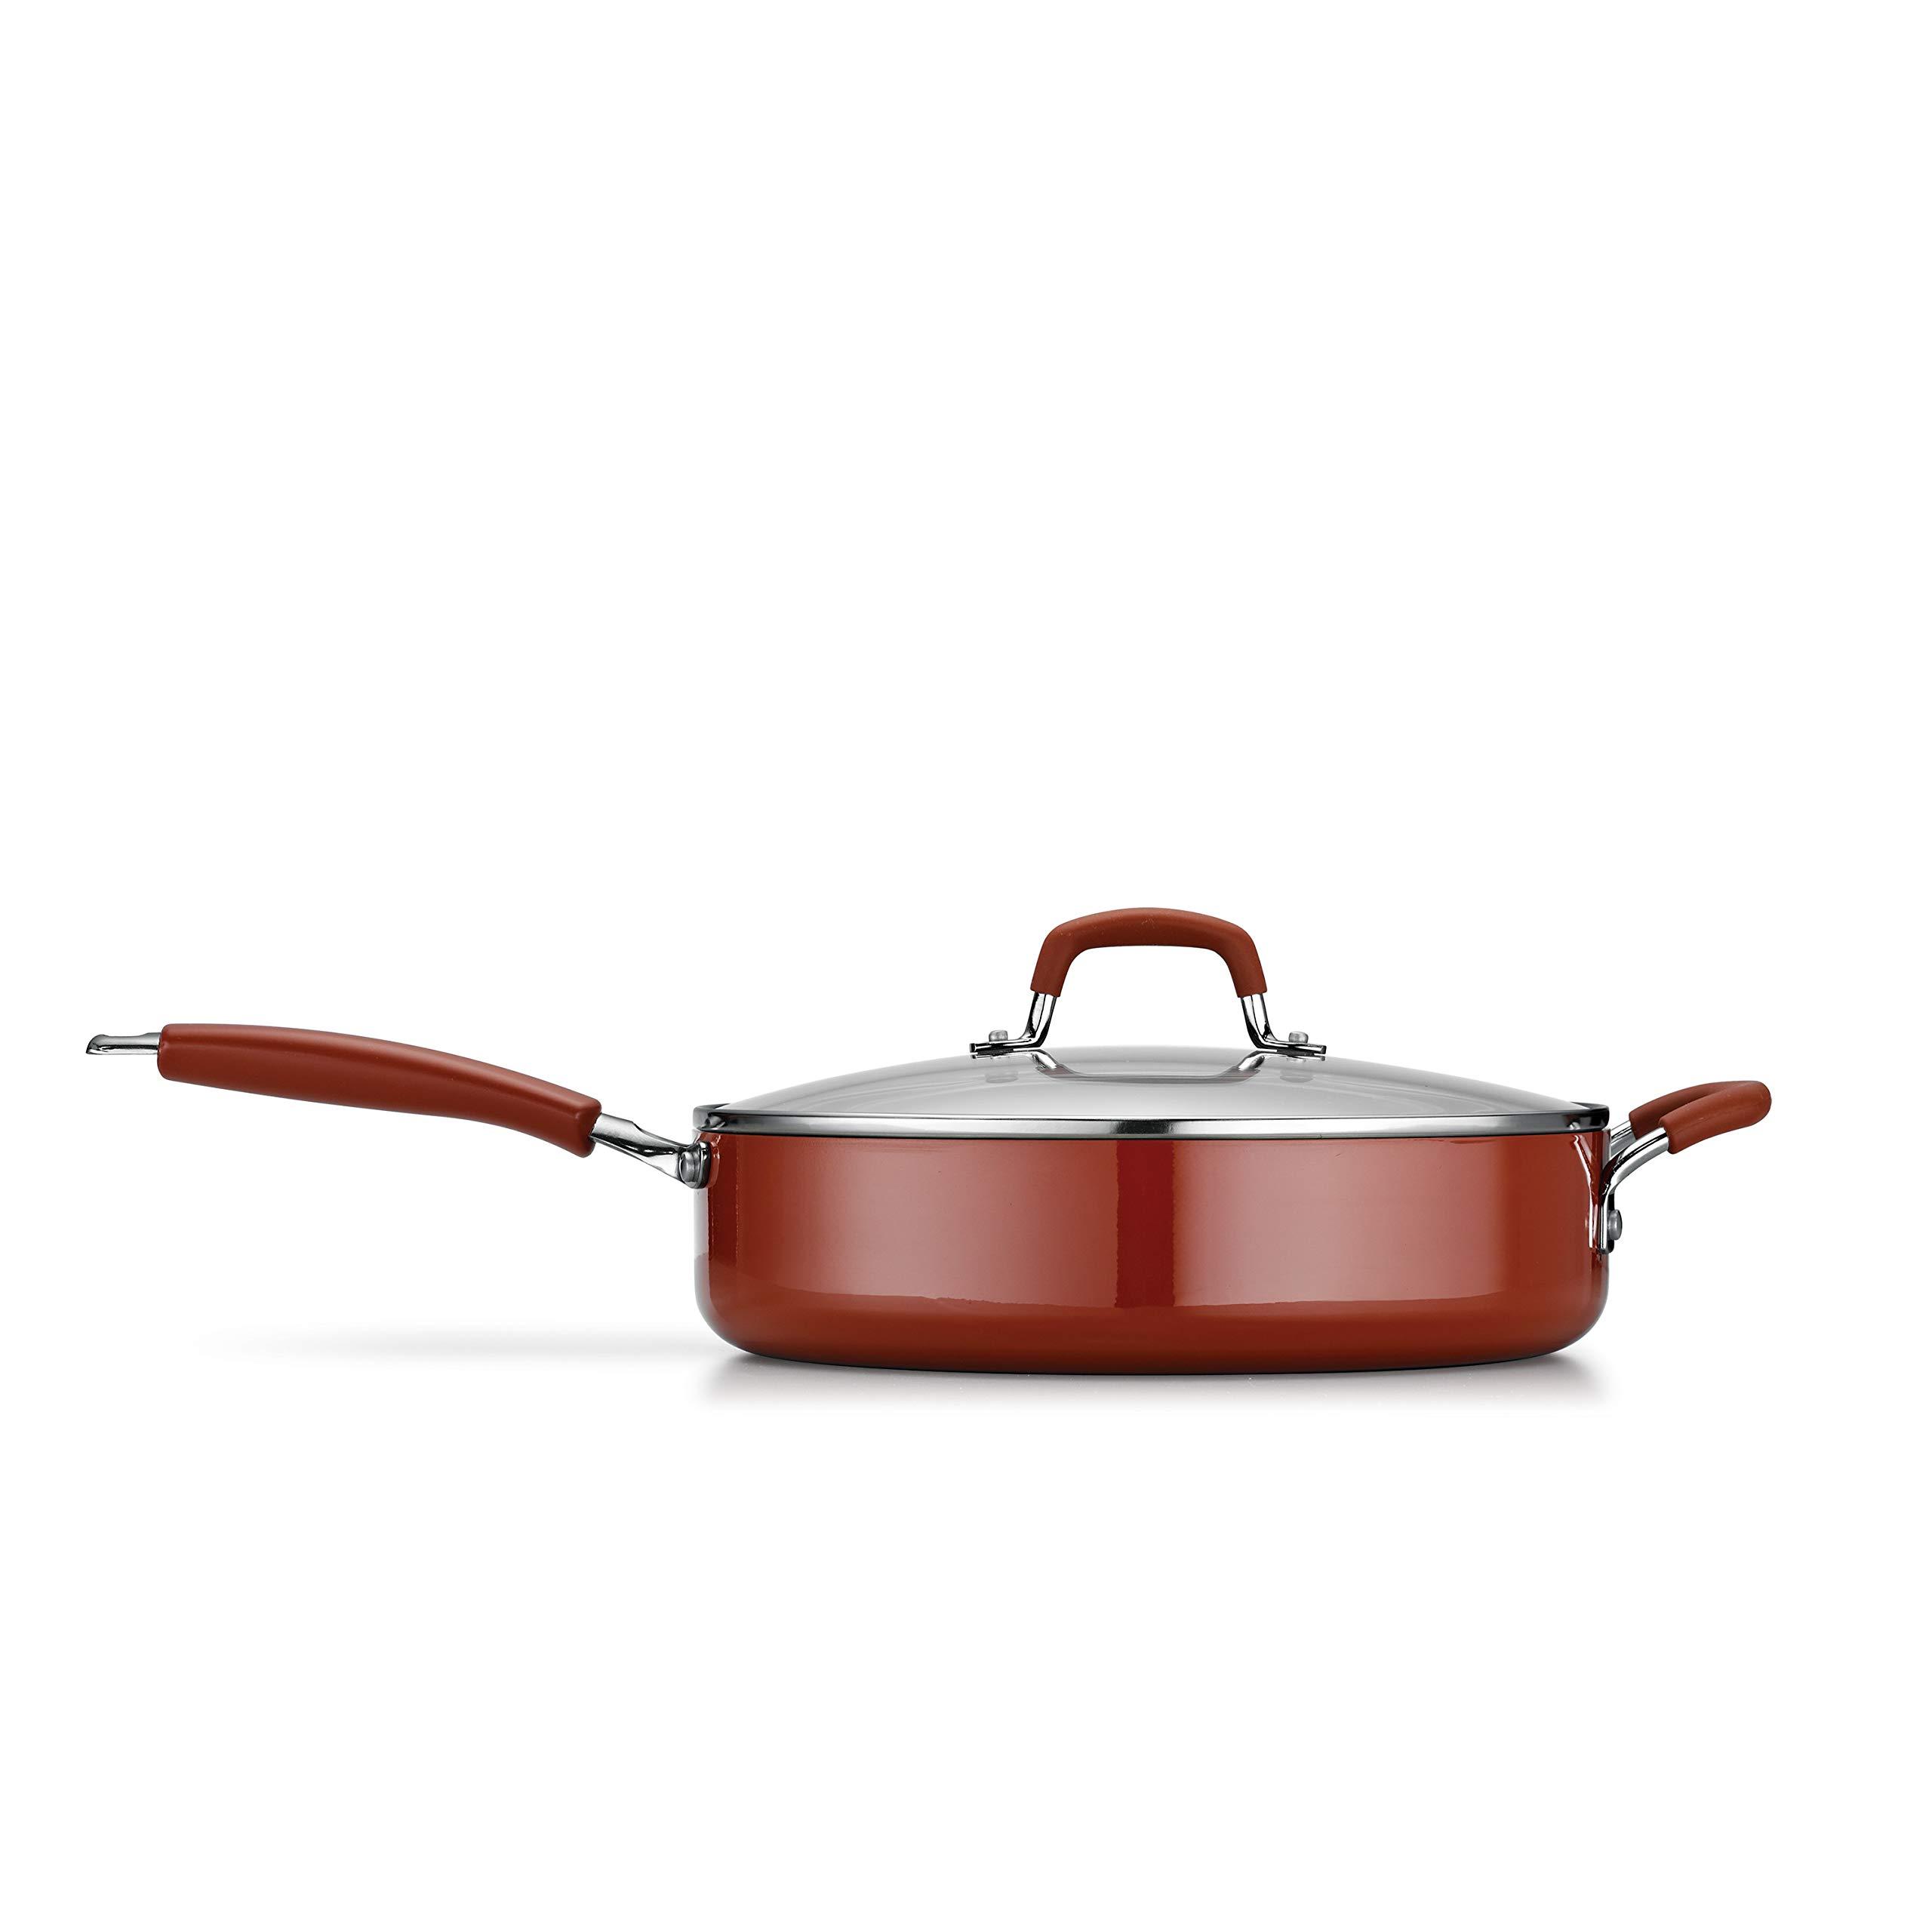 Tramontina 80151/504 Simple Cooking Aluminum Red Handles, 3 Piece, Porcelain Enamel Deep Saute Set, Spice by Tramontina (Image #2)